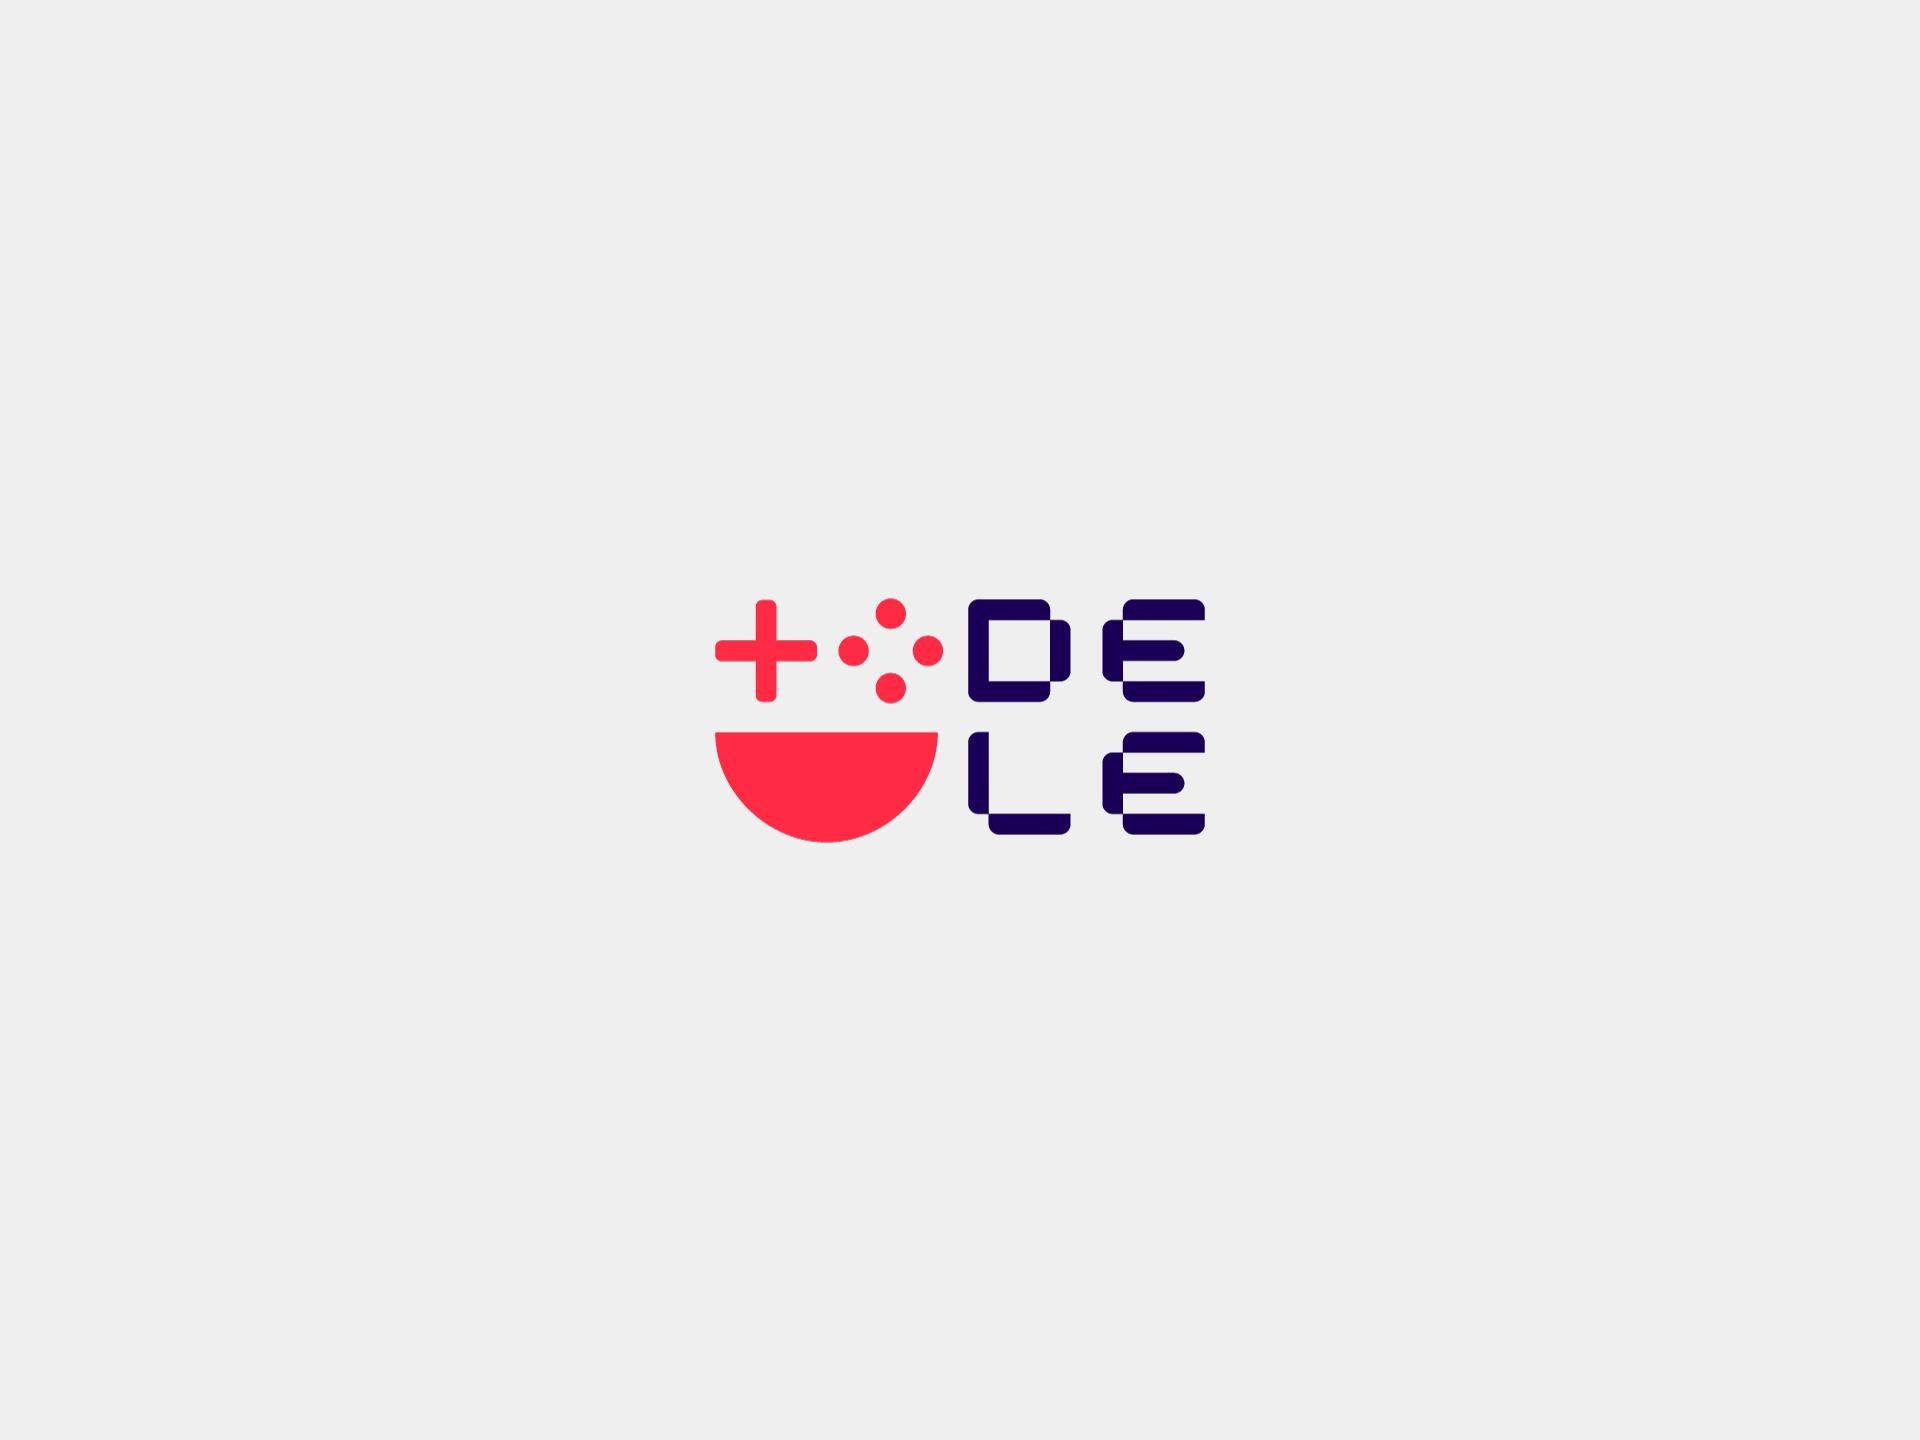 DELE - Gaming Accessory Retailer - Branding, Identity Design, Logo, Illustration, UI/UX design and print